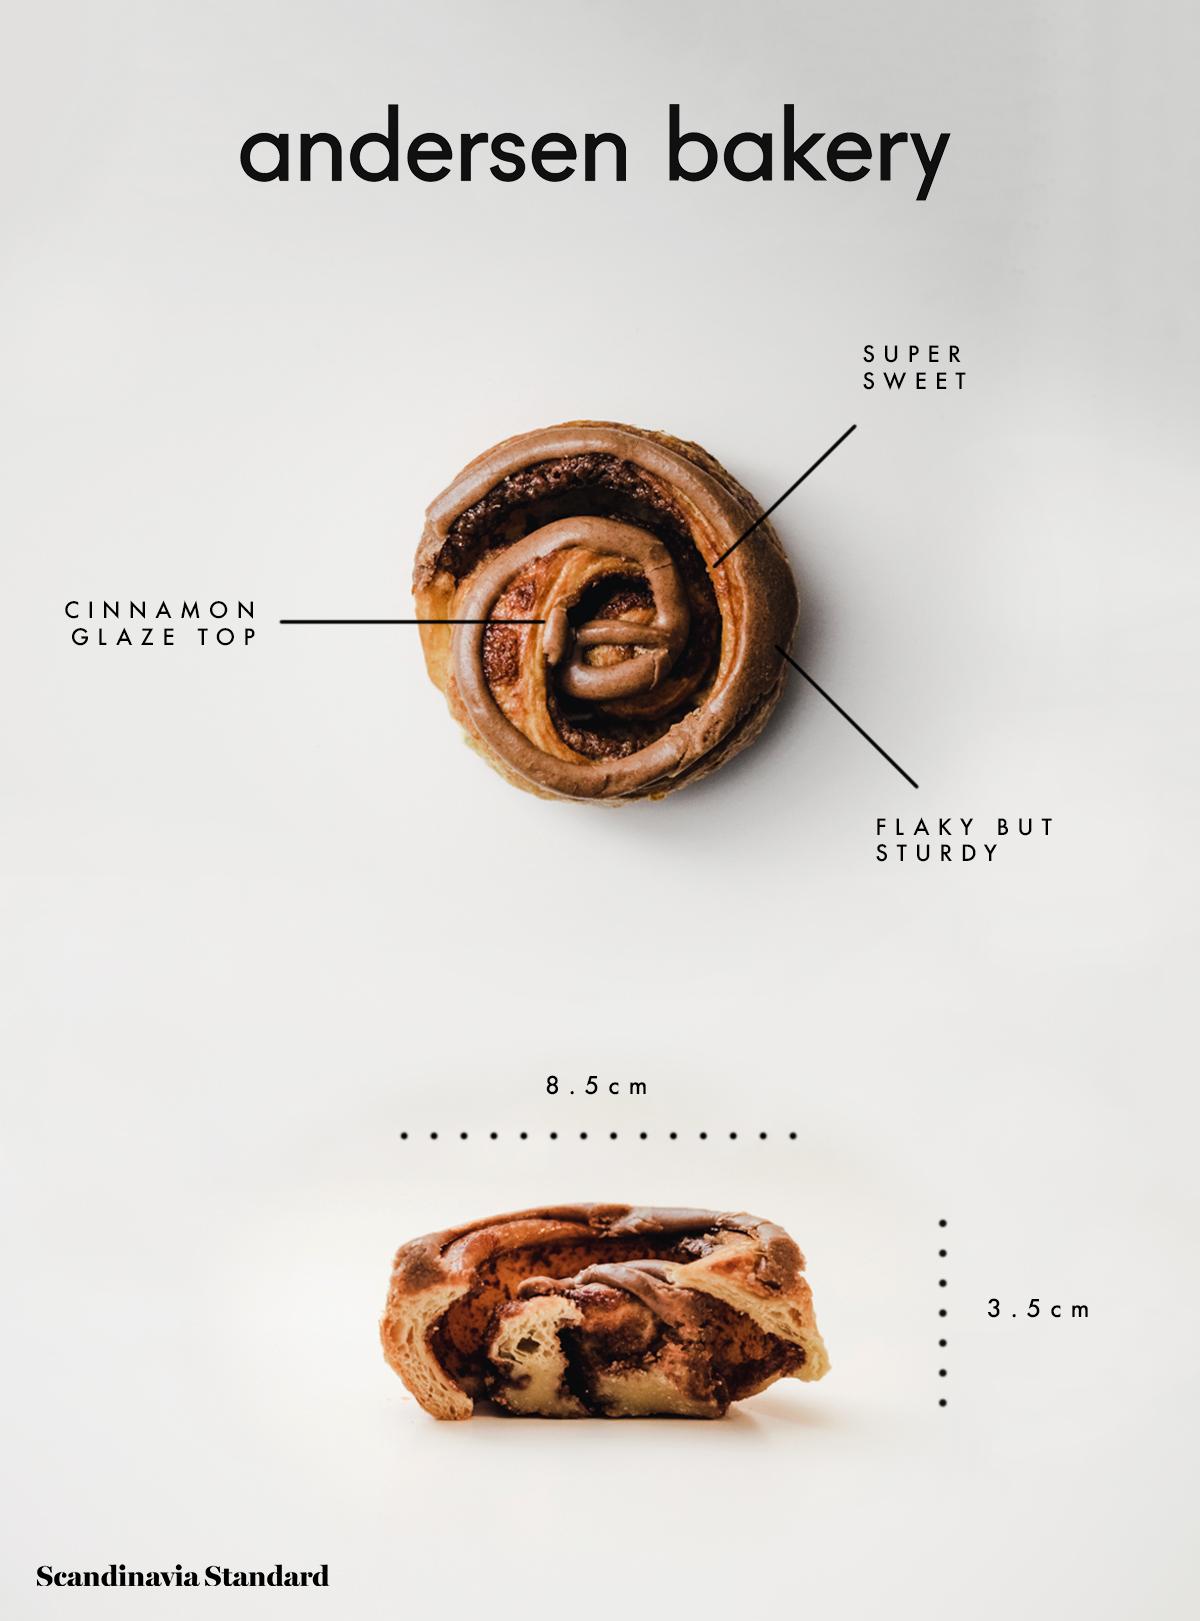 4. Andersen Bakery Cinnamon Bun Kanelsnegle Copenhagen